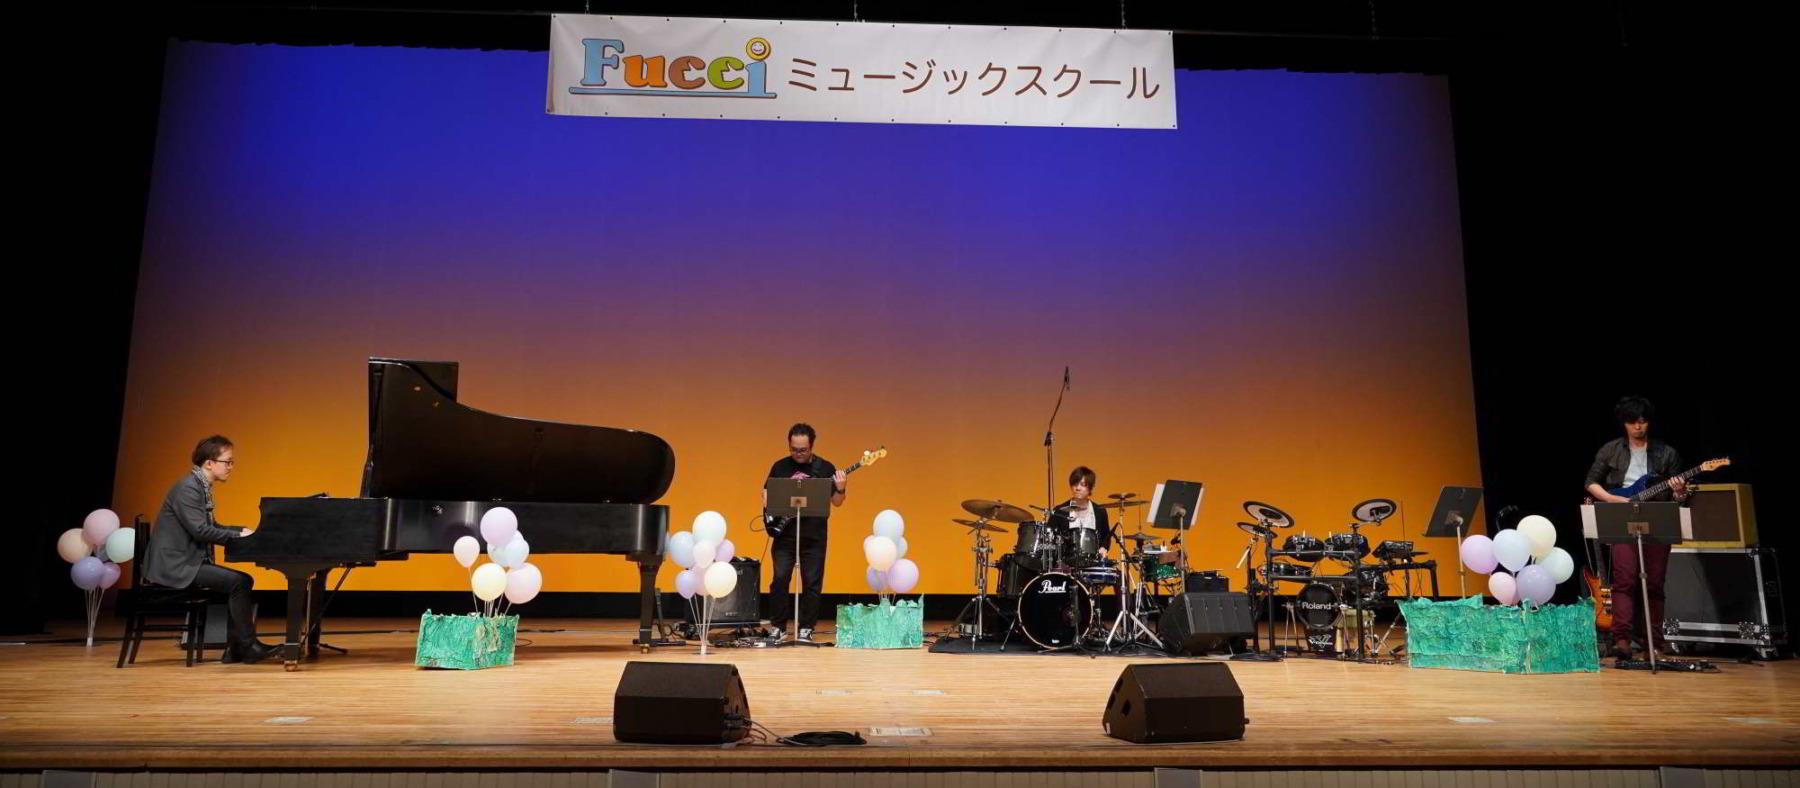 Fucciミュージックスクール発表会2021講師演奏